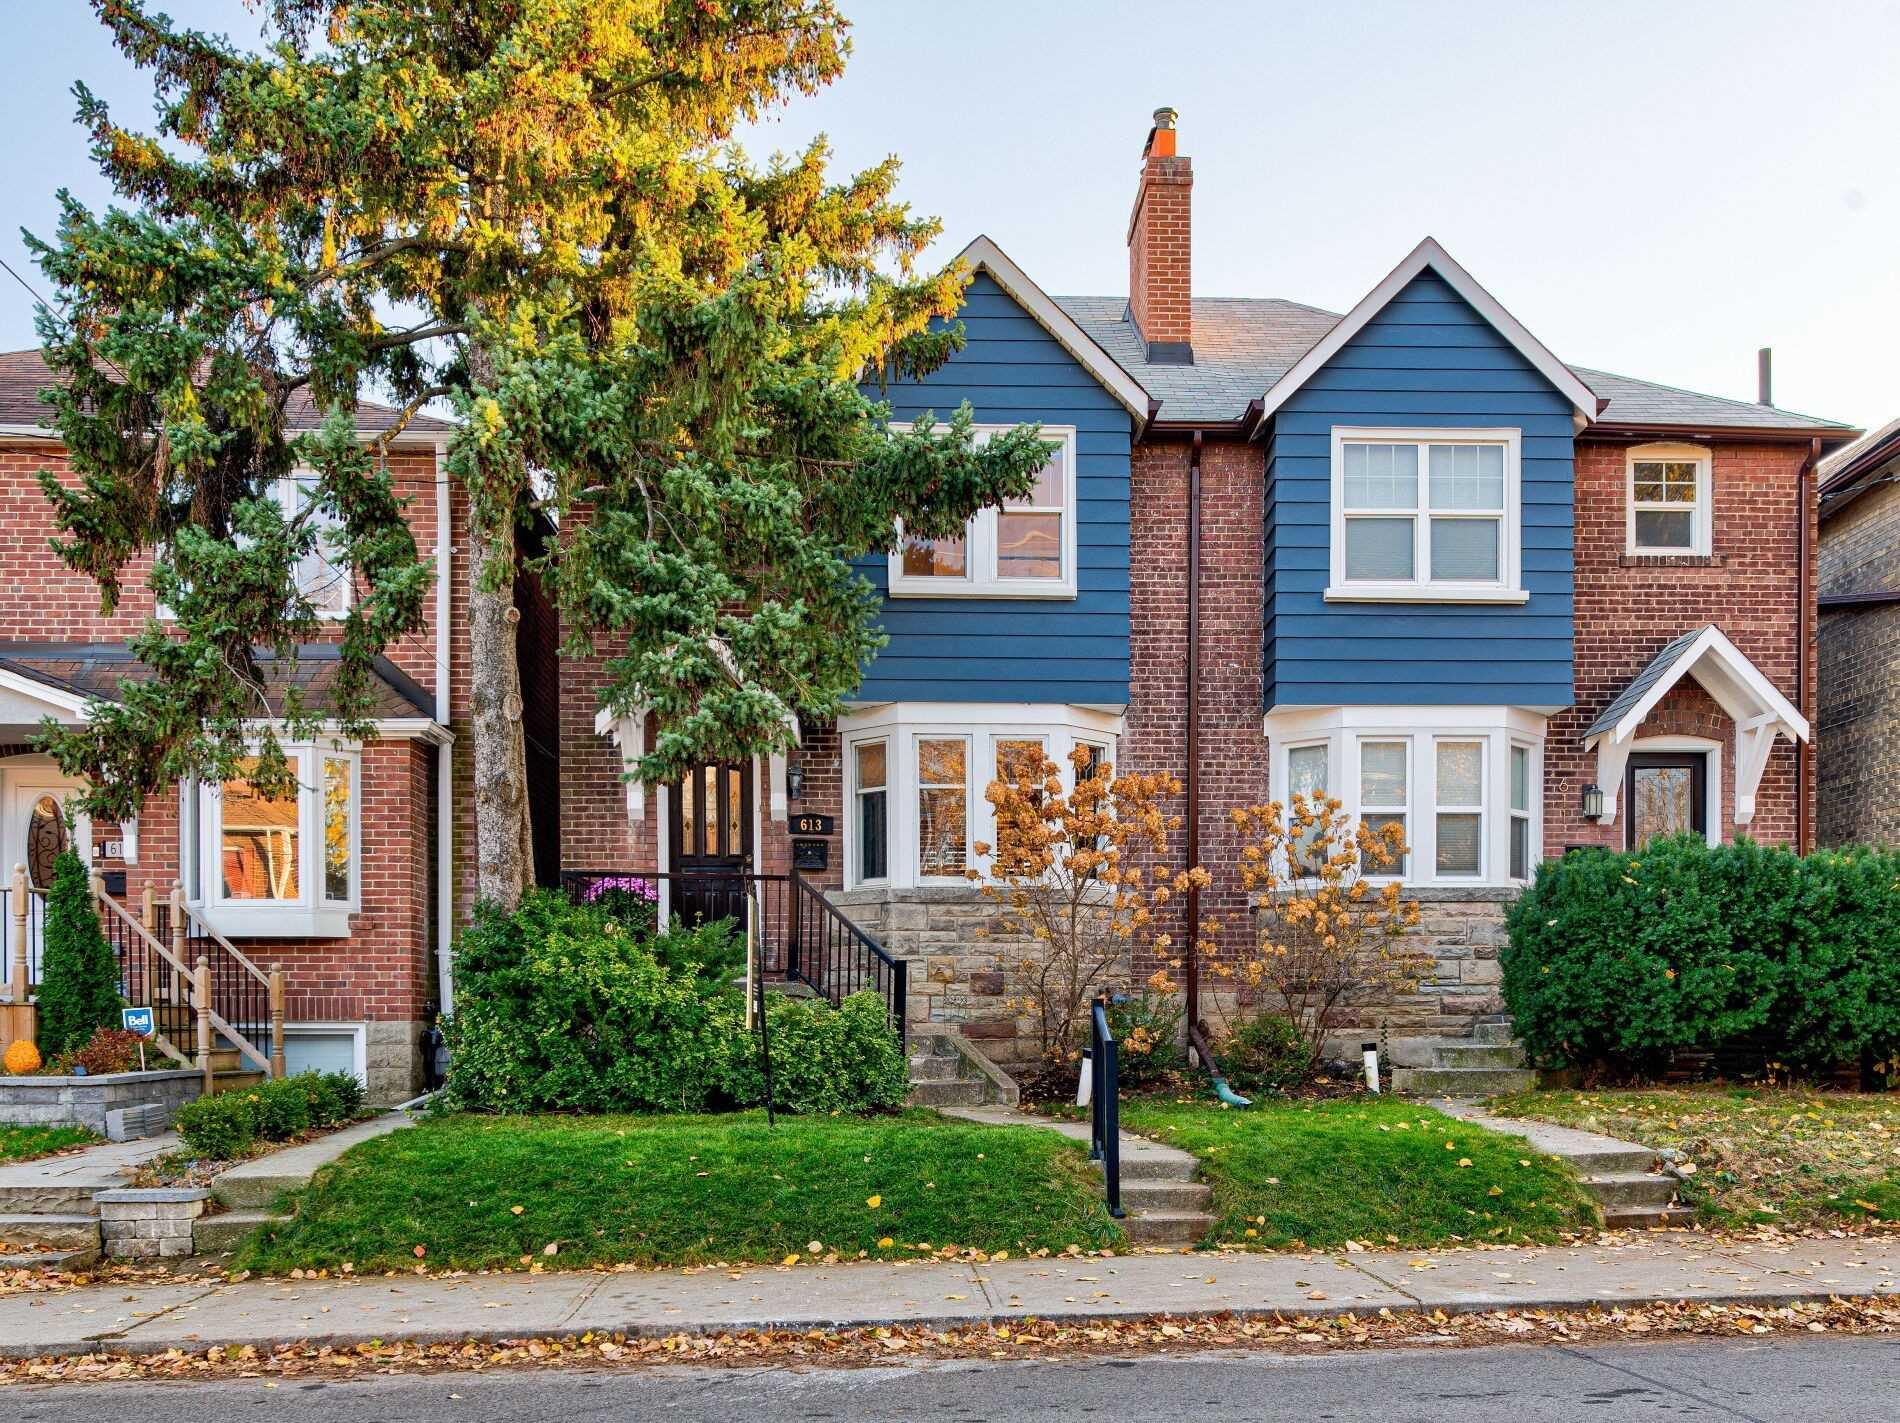 Main Photo: 613 Soudan Avenue in Toronto: Mount Pleasant East House (2-Storey) for sale (Toronto C10)  : MLS®# C4983508